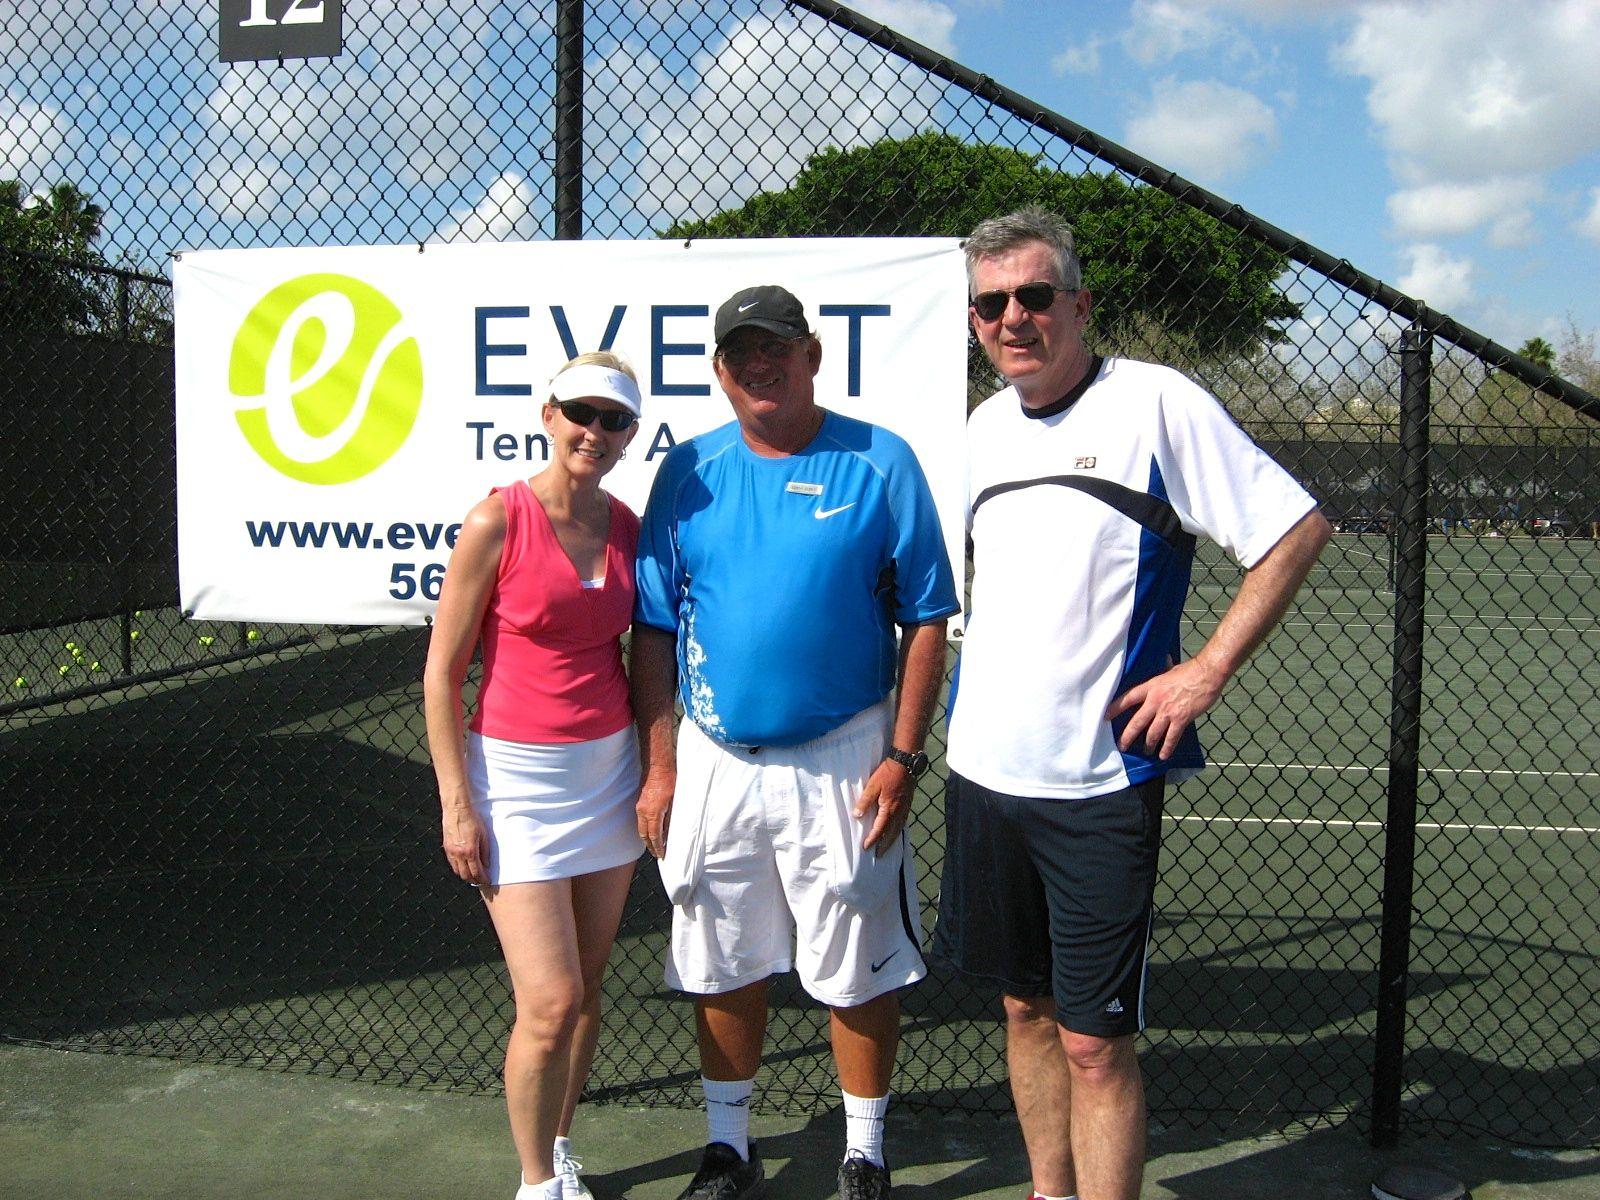 tennis-tourist-Evert-Adult-Tennis-Academy-Drew-Evert-Boca-Raton-Florida-teri-church